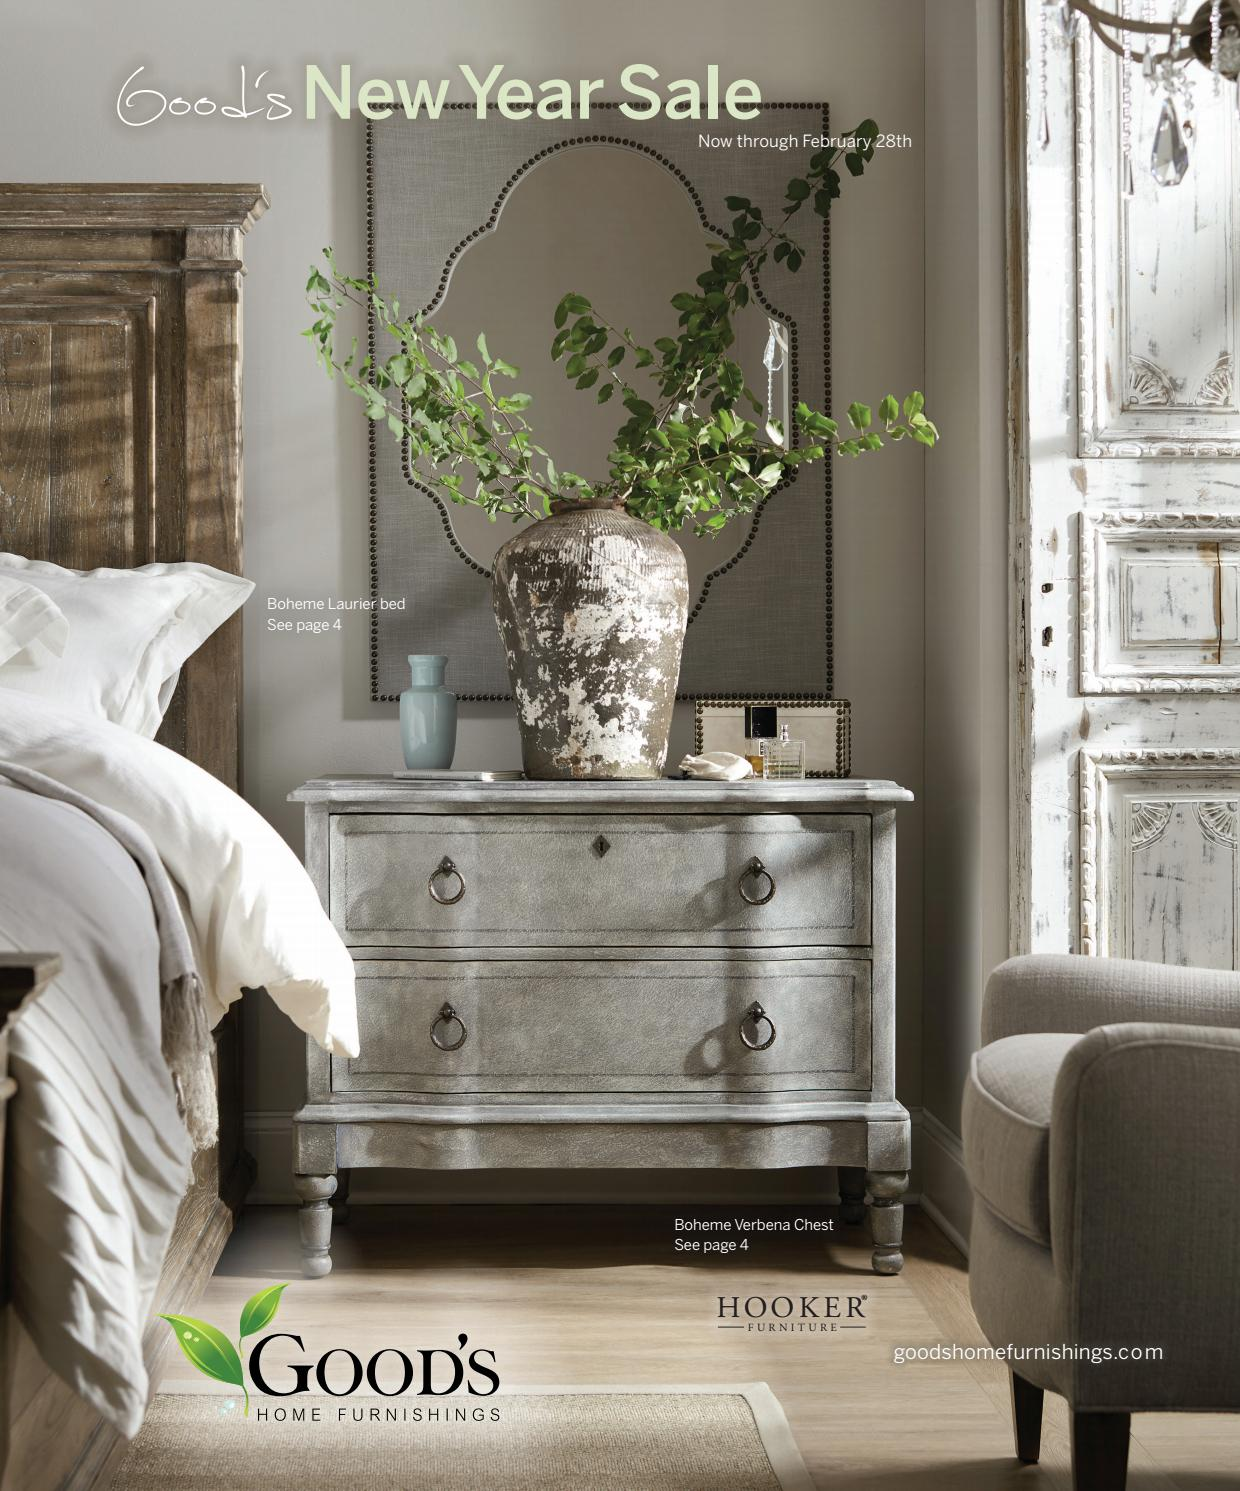 Goods home furnishings new year sale lookbook 2018 charlotte and hickory nc by goods home furnishings issuu